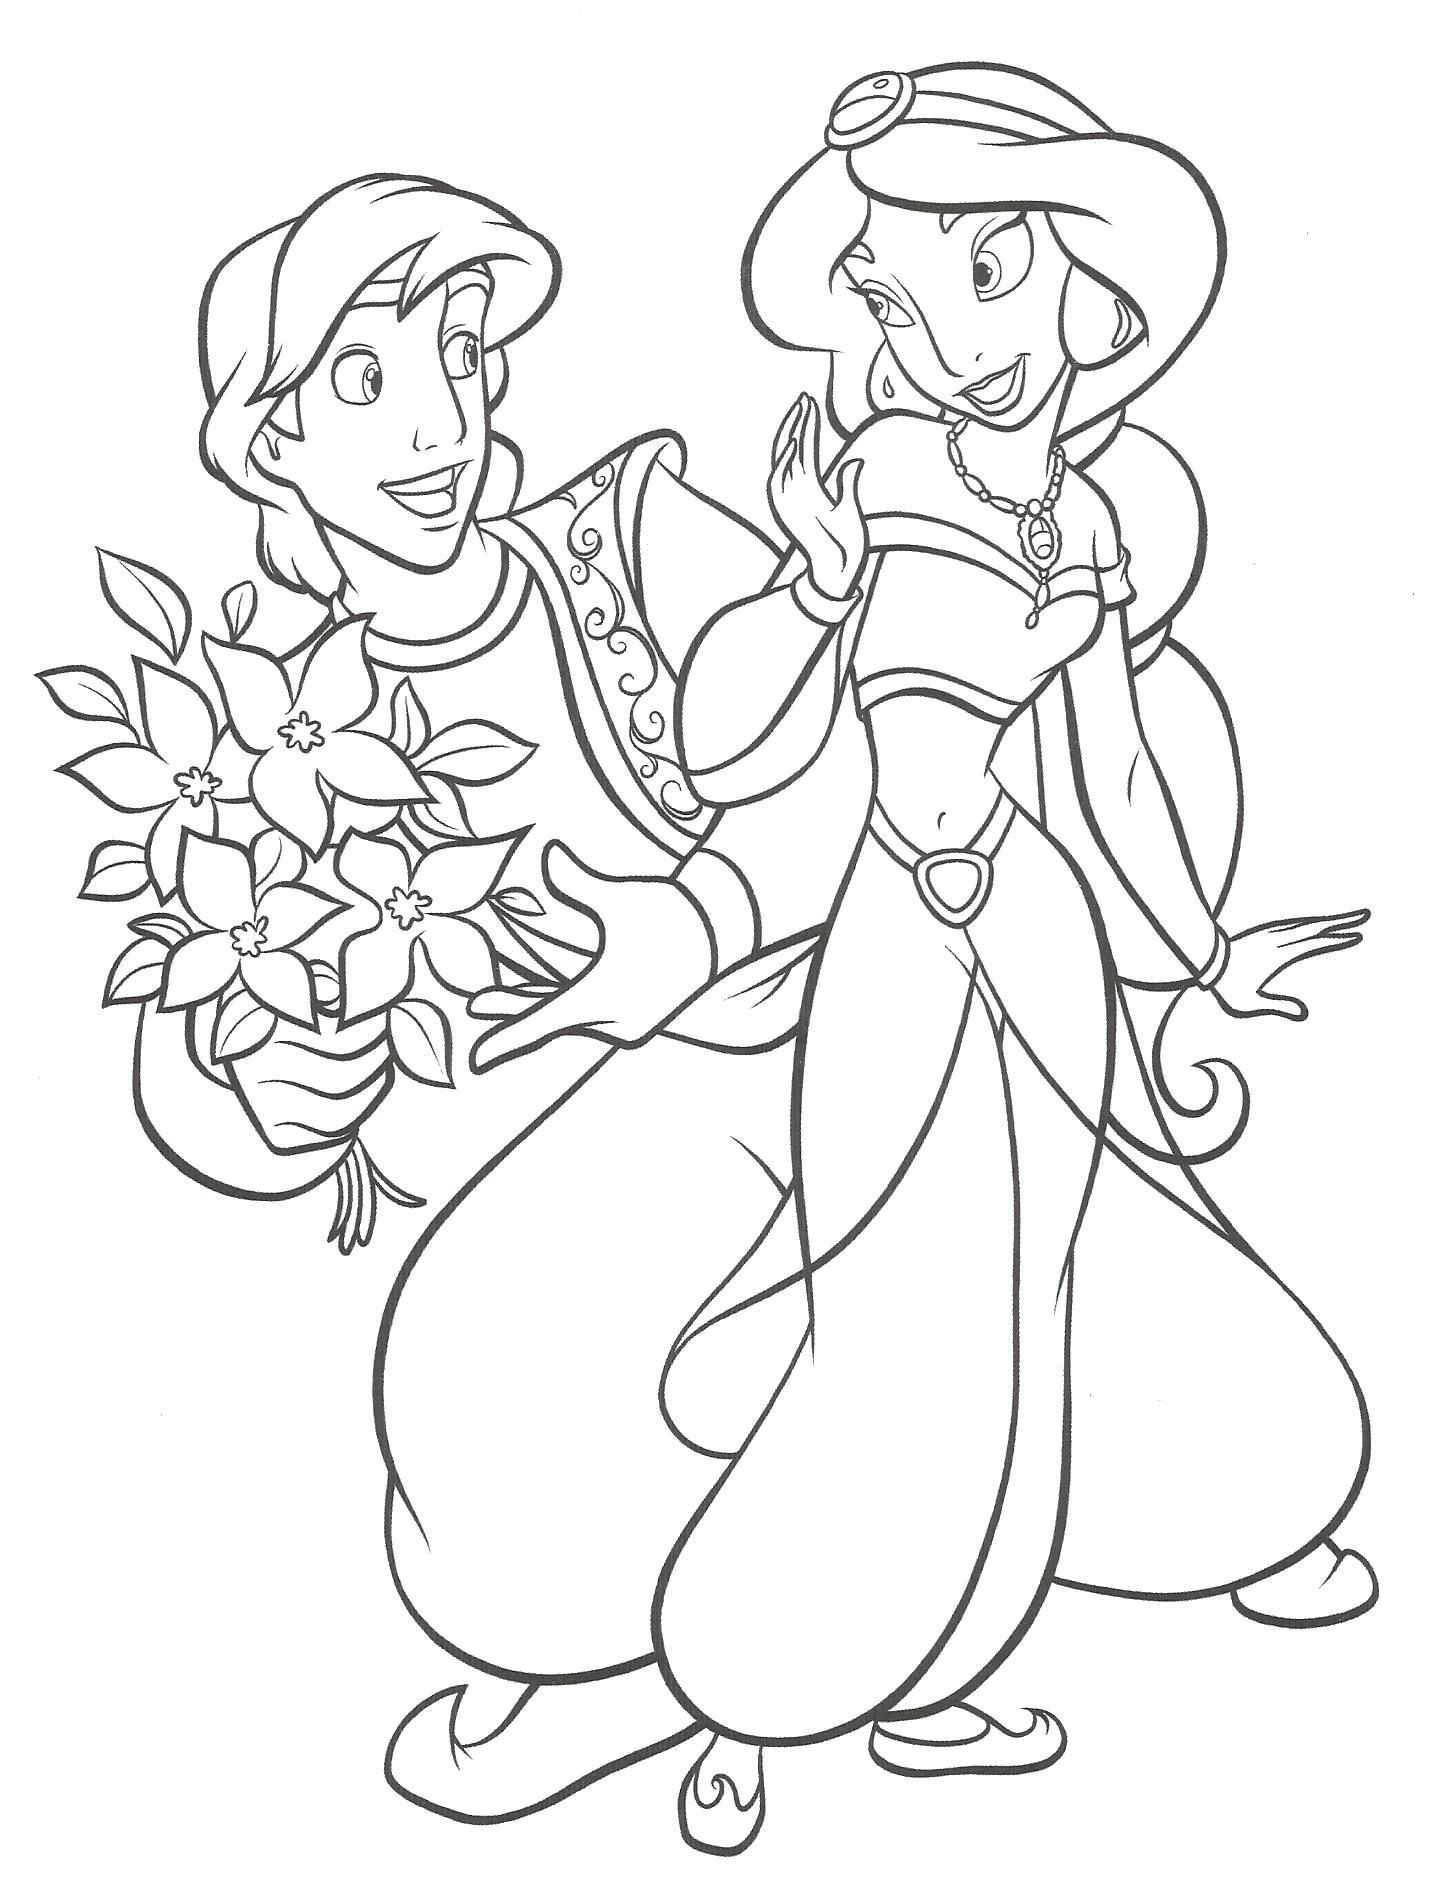 jeux dessin jasmine gratuit